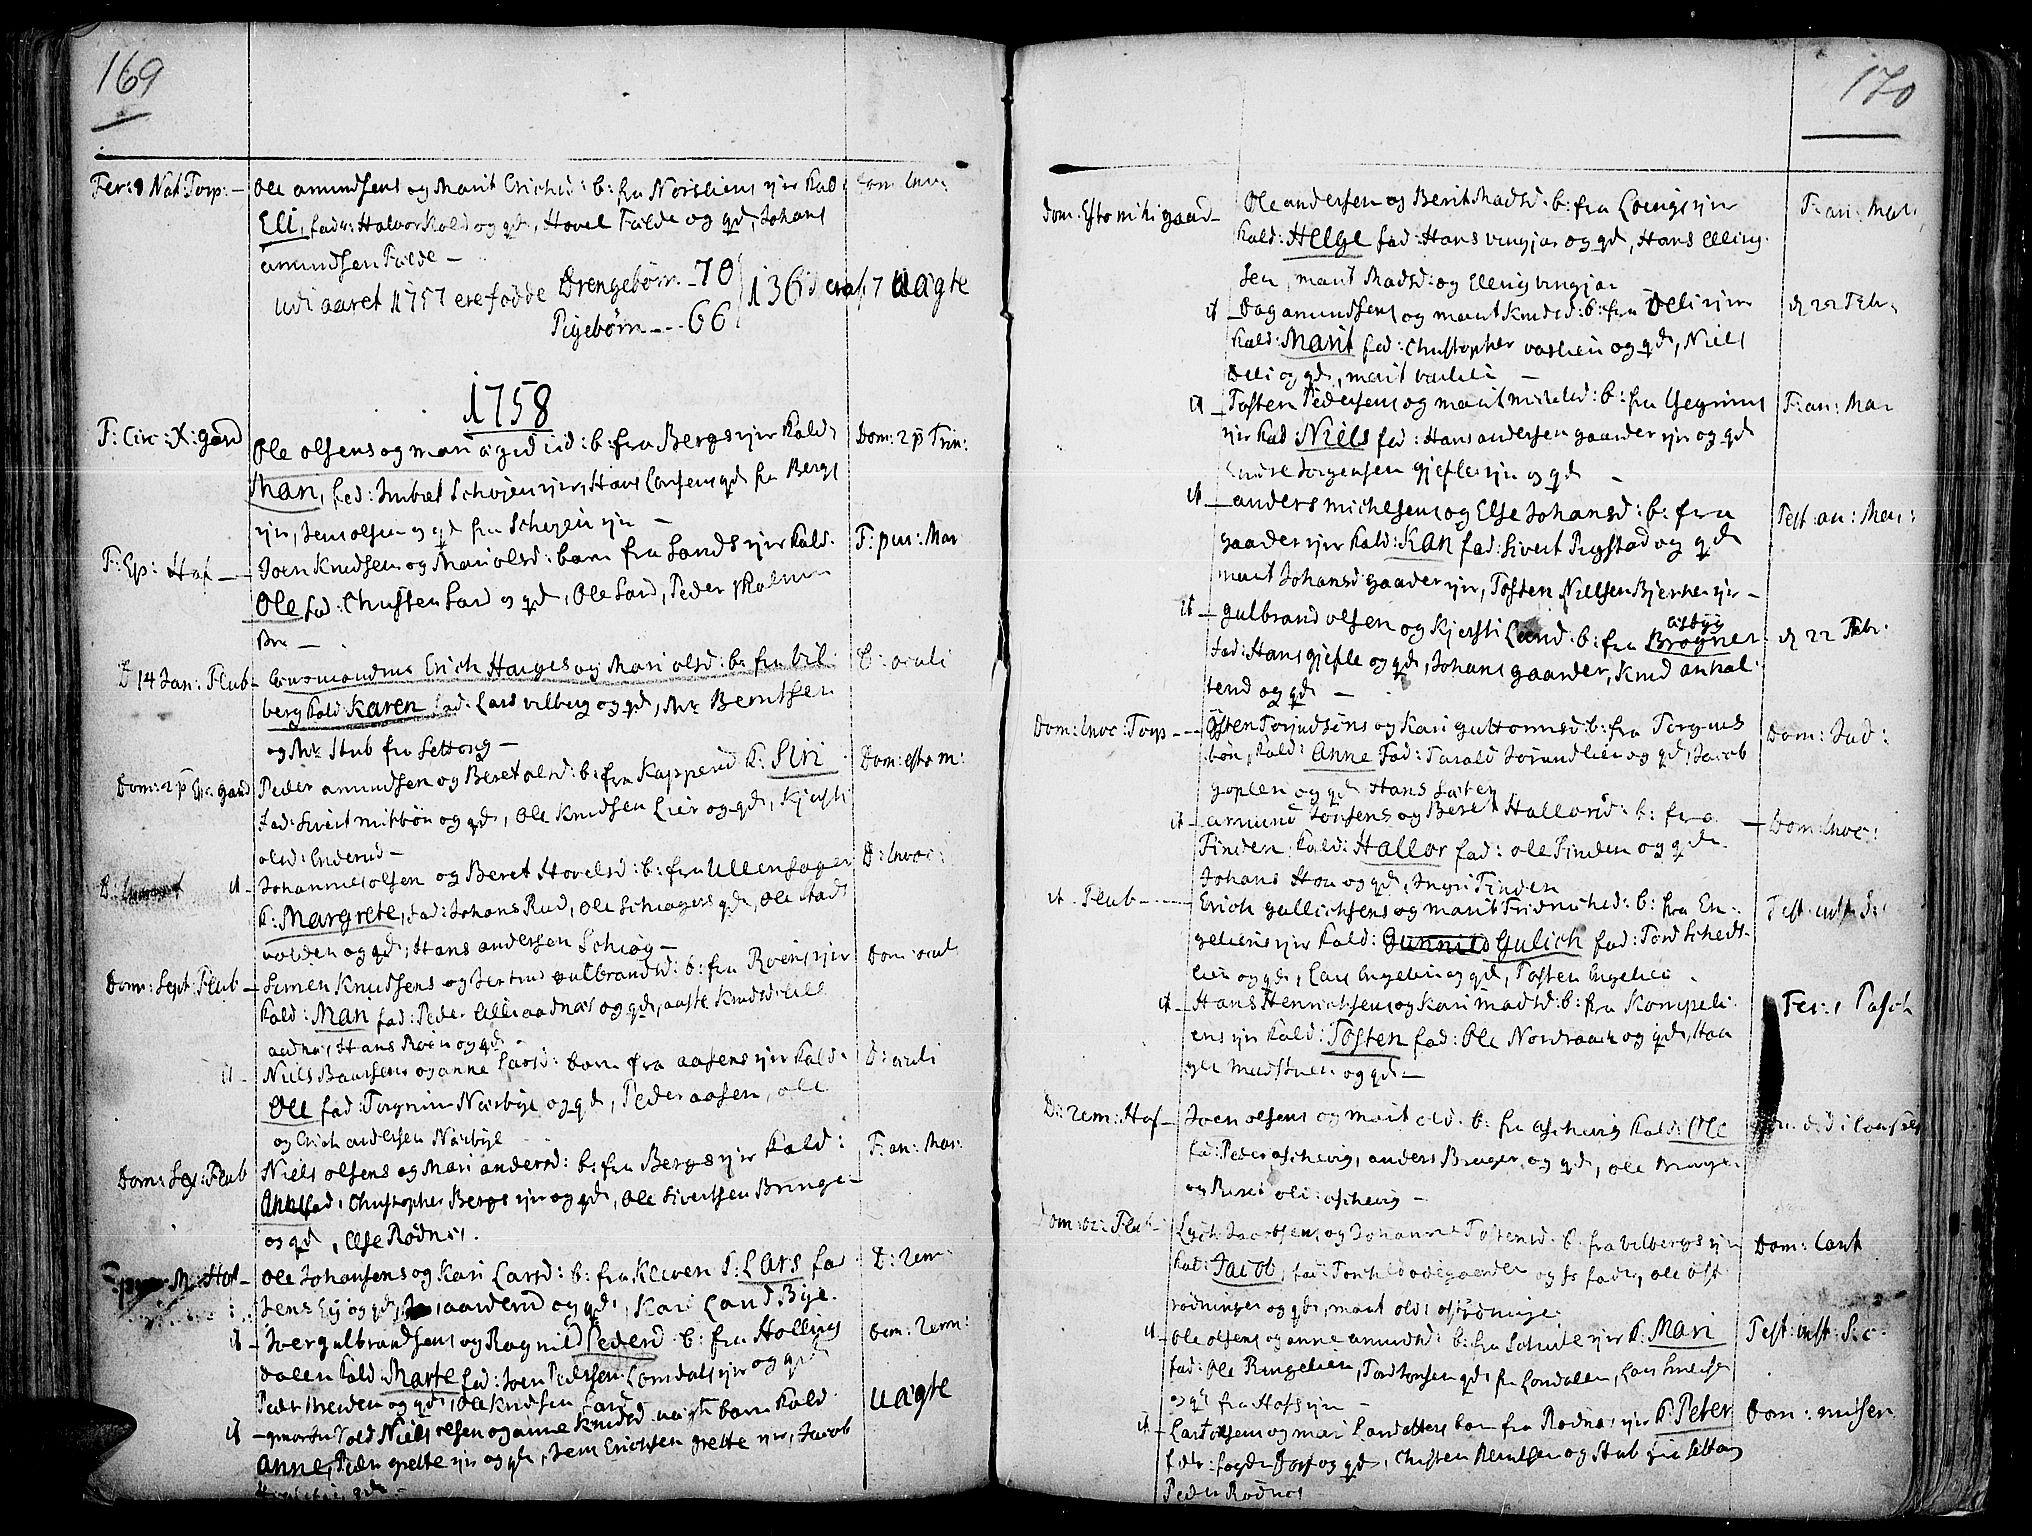 SAH, Land prestekontor, Ministerialbok nr. 2, 1733-1764, s. 169-170